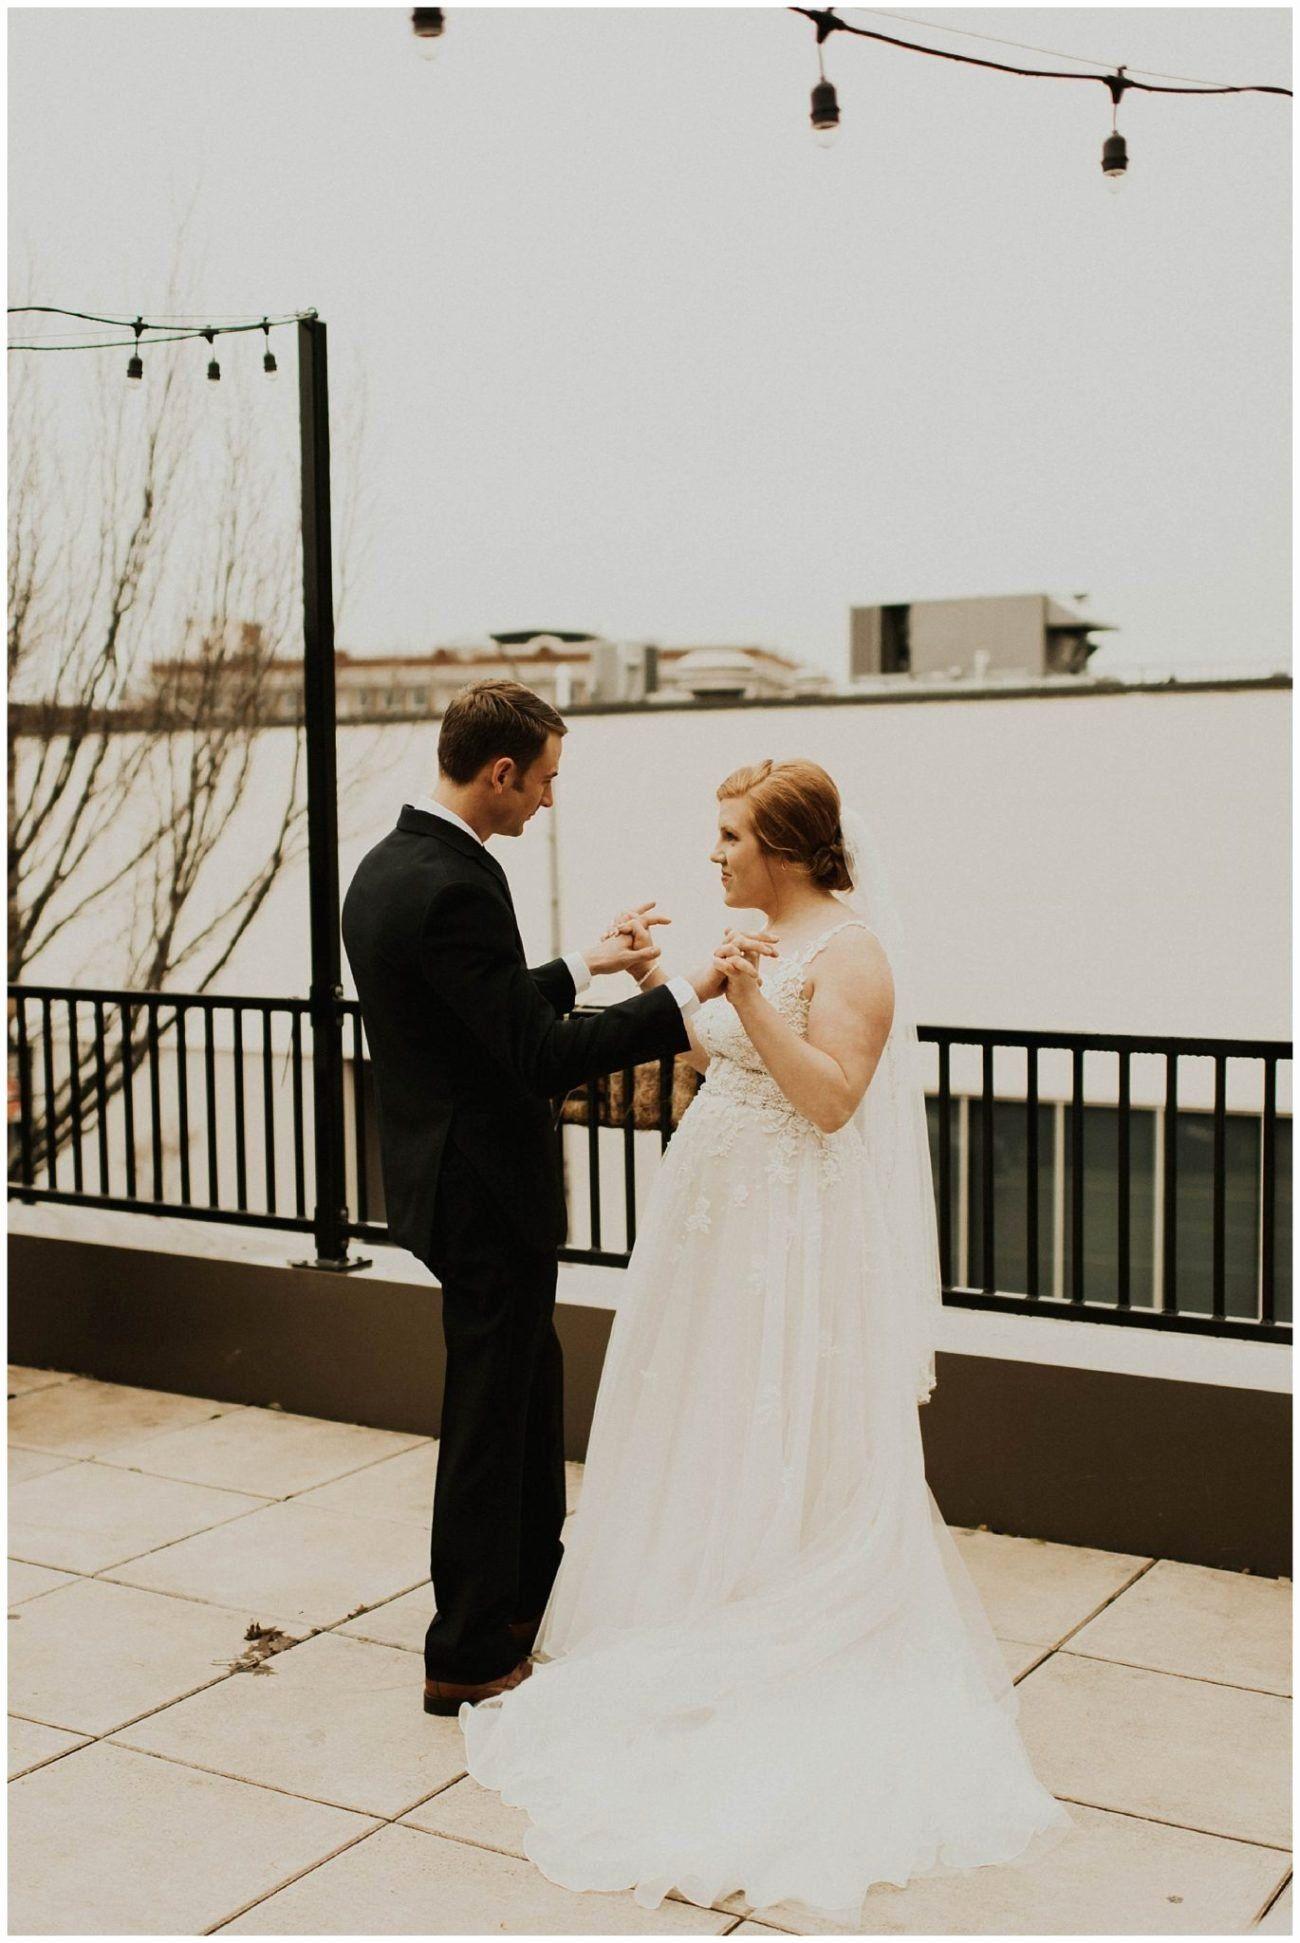 Wedding Dress Consignment Boston Elegant Johnny Eliza Classic Winter Wedding Lauren F In 2020 Wedding Dresses Boston Wedding Dress Classic Wedding Dress